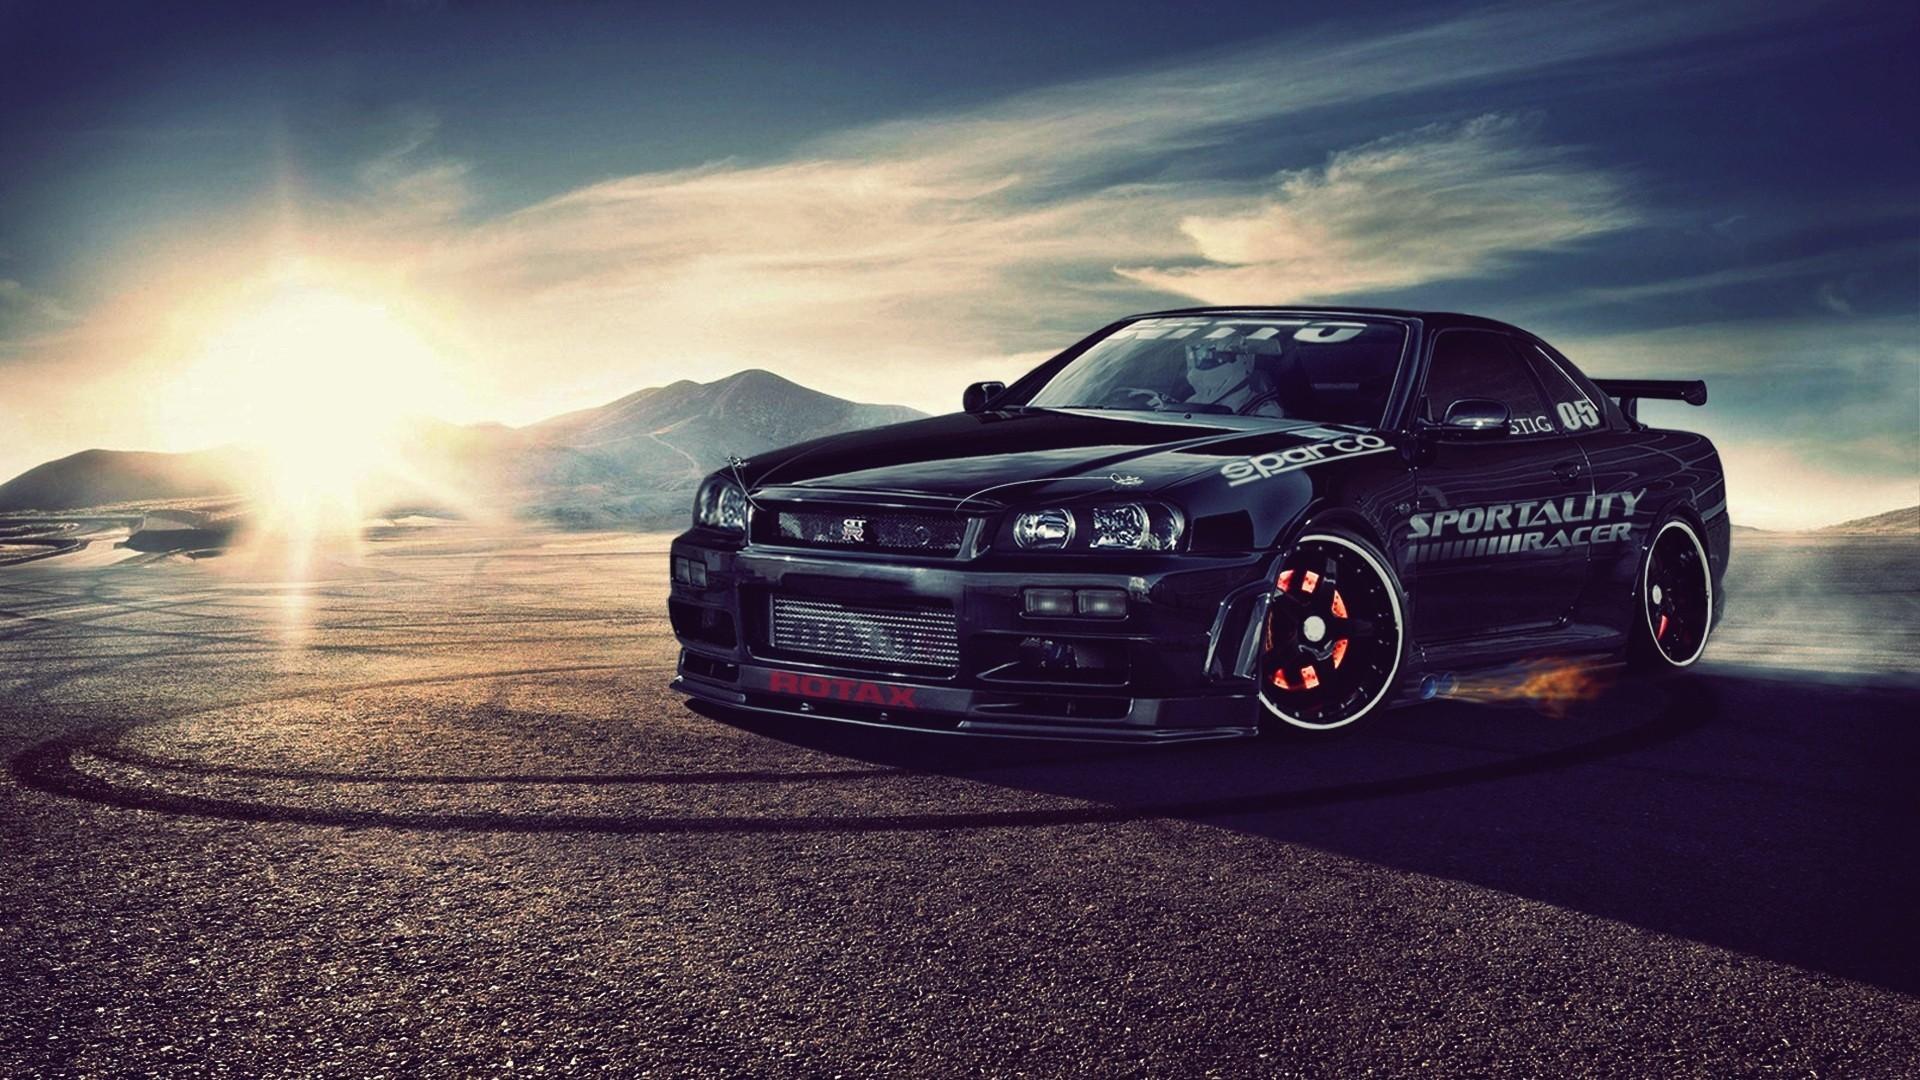 Free download Nissan skyline r34 gt r